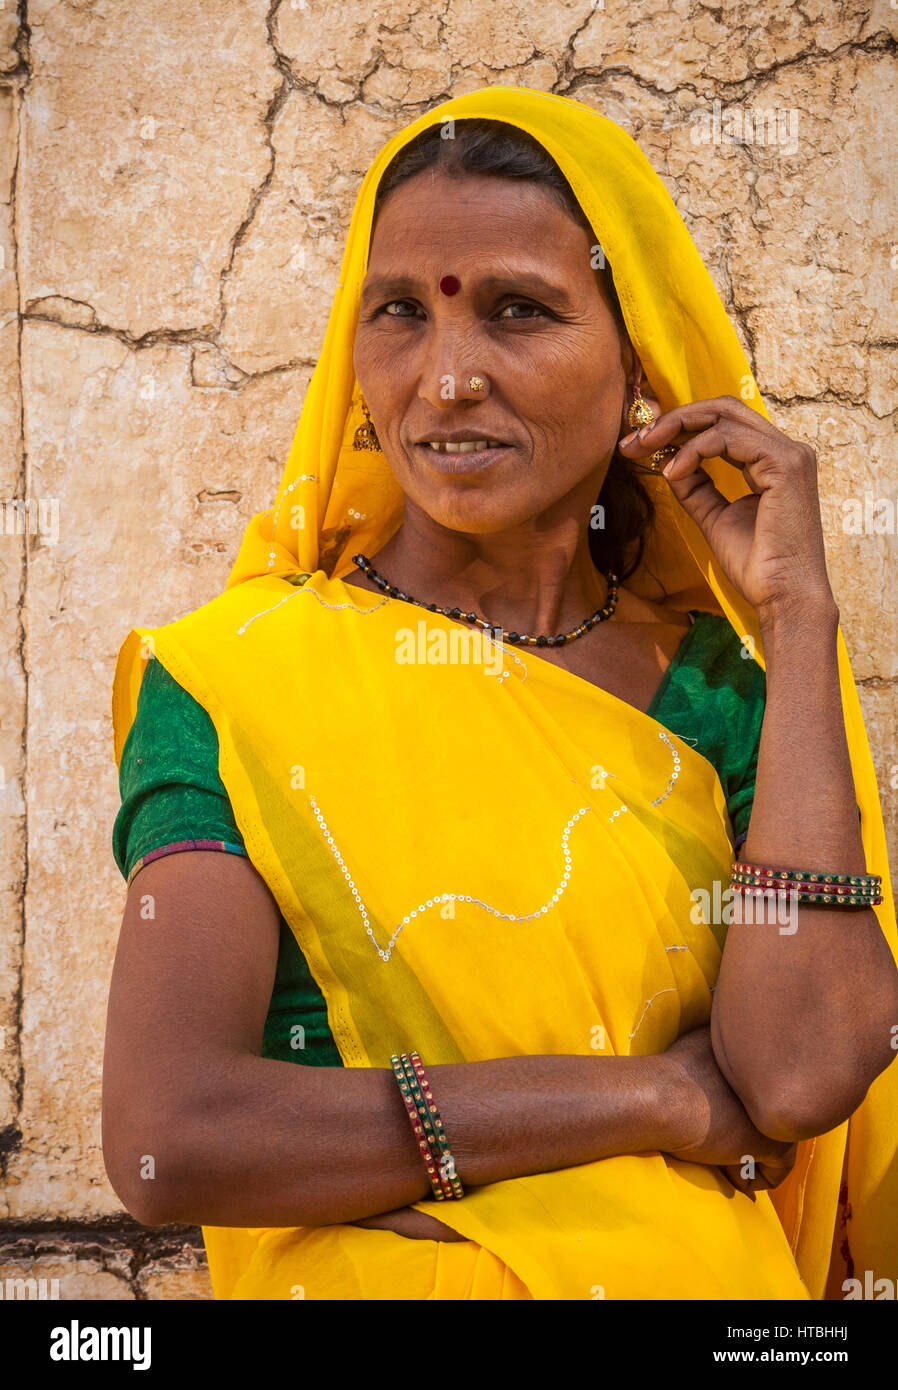 Una donna indiana in posa per fotografie in Amer Palace, Amer, Rajasthan, India. Immagini Stock